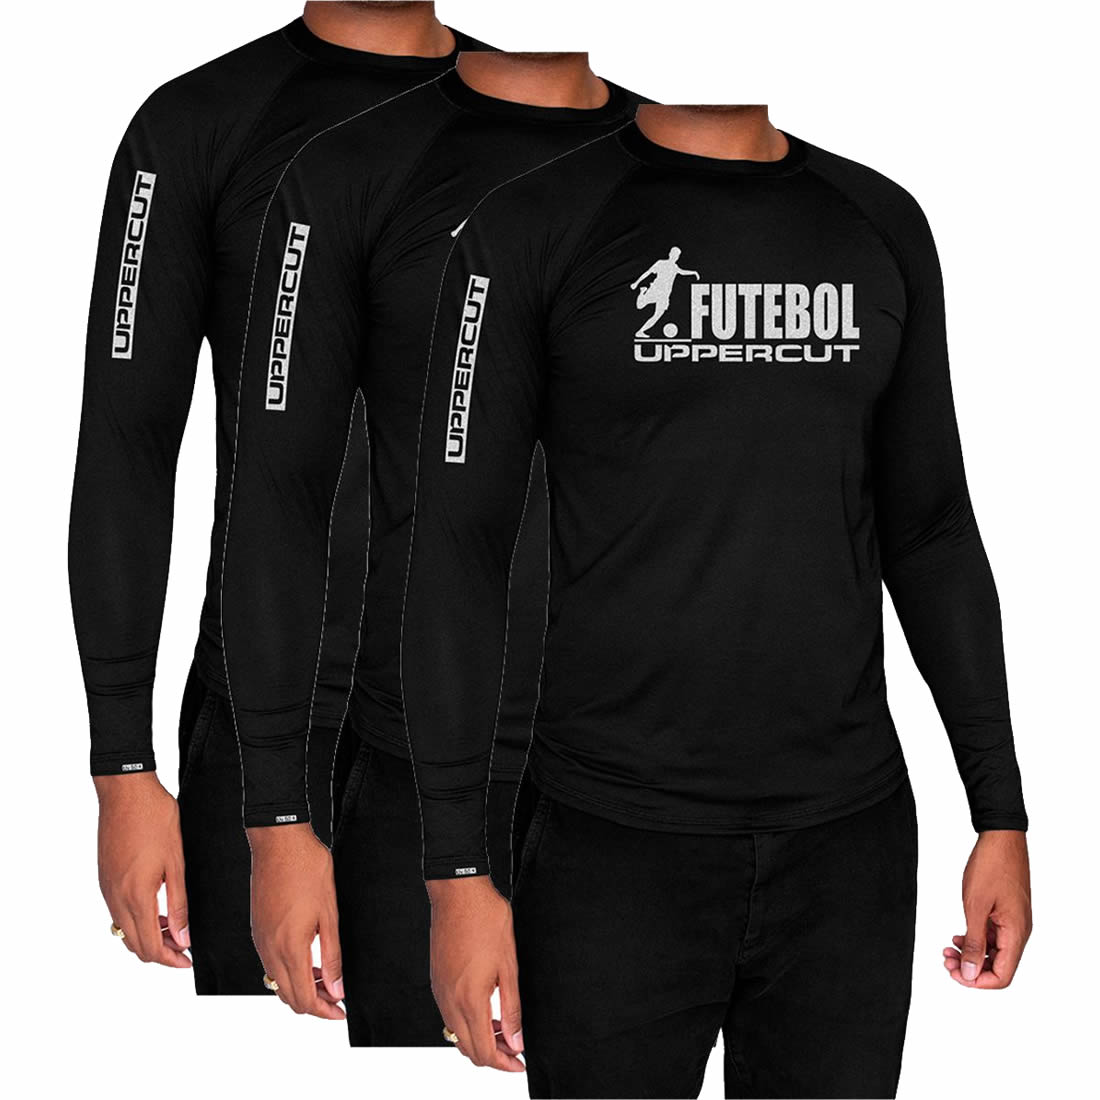 Kit 3 Camisas Proteção Solar ML - UV50+ Futebol - Kt27